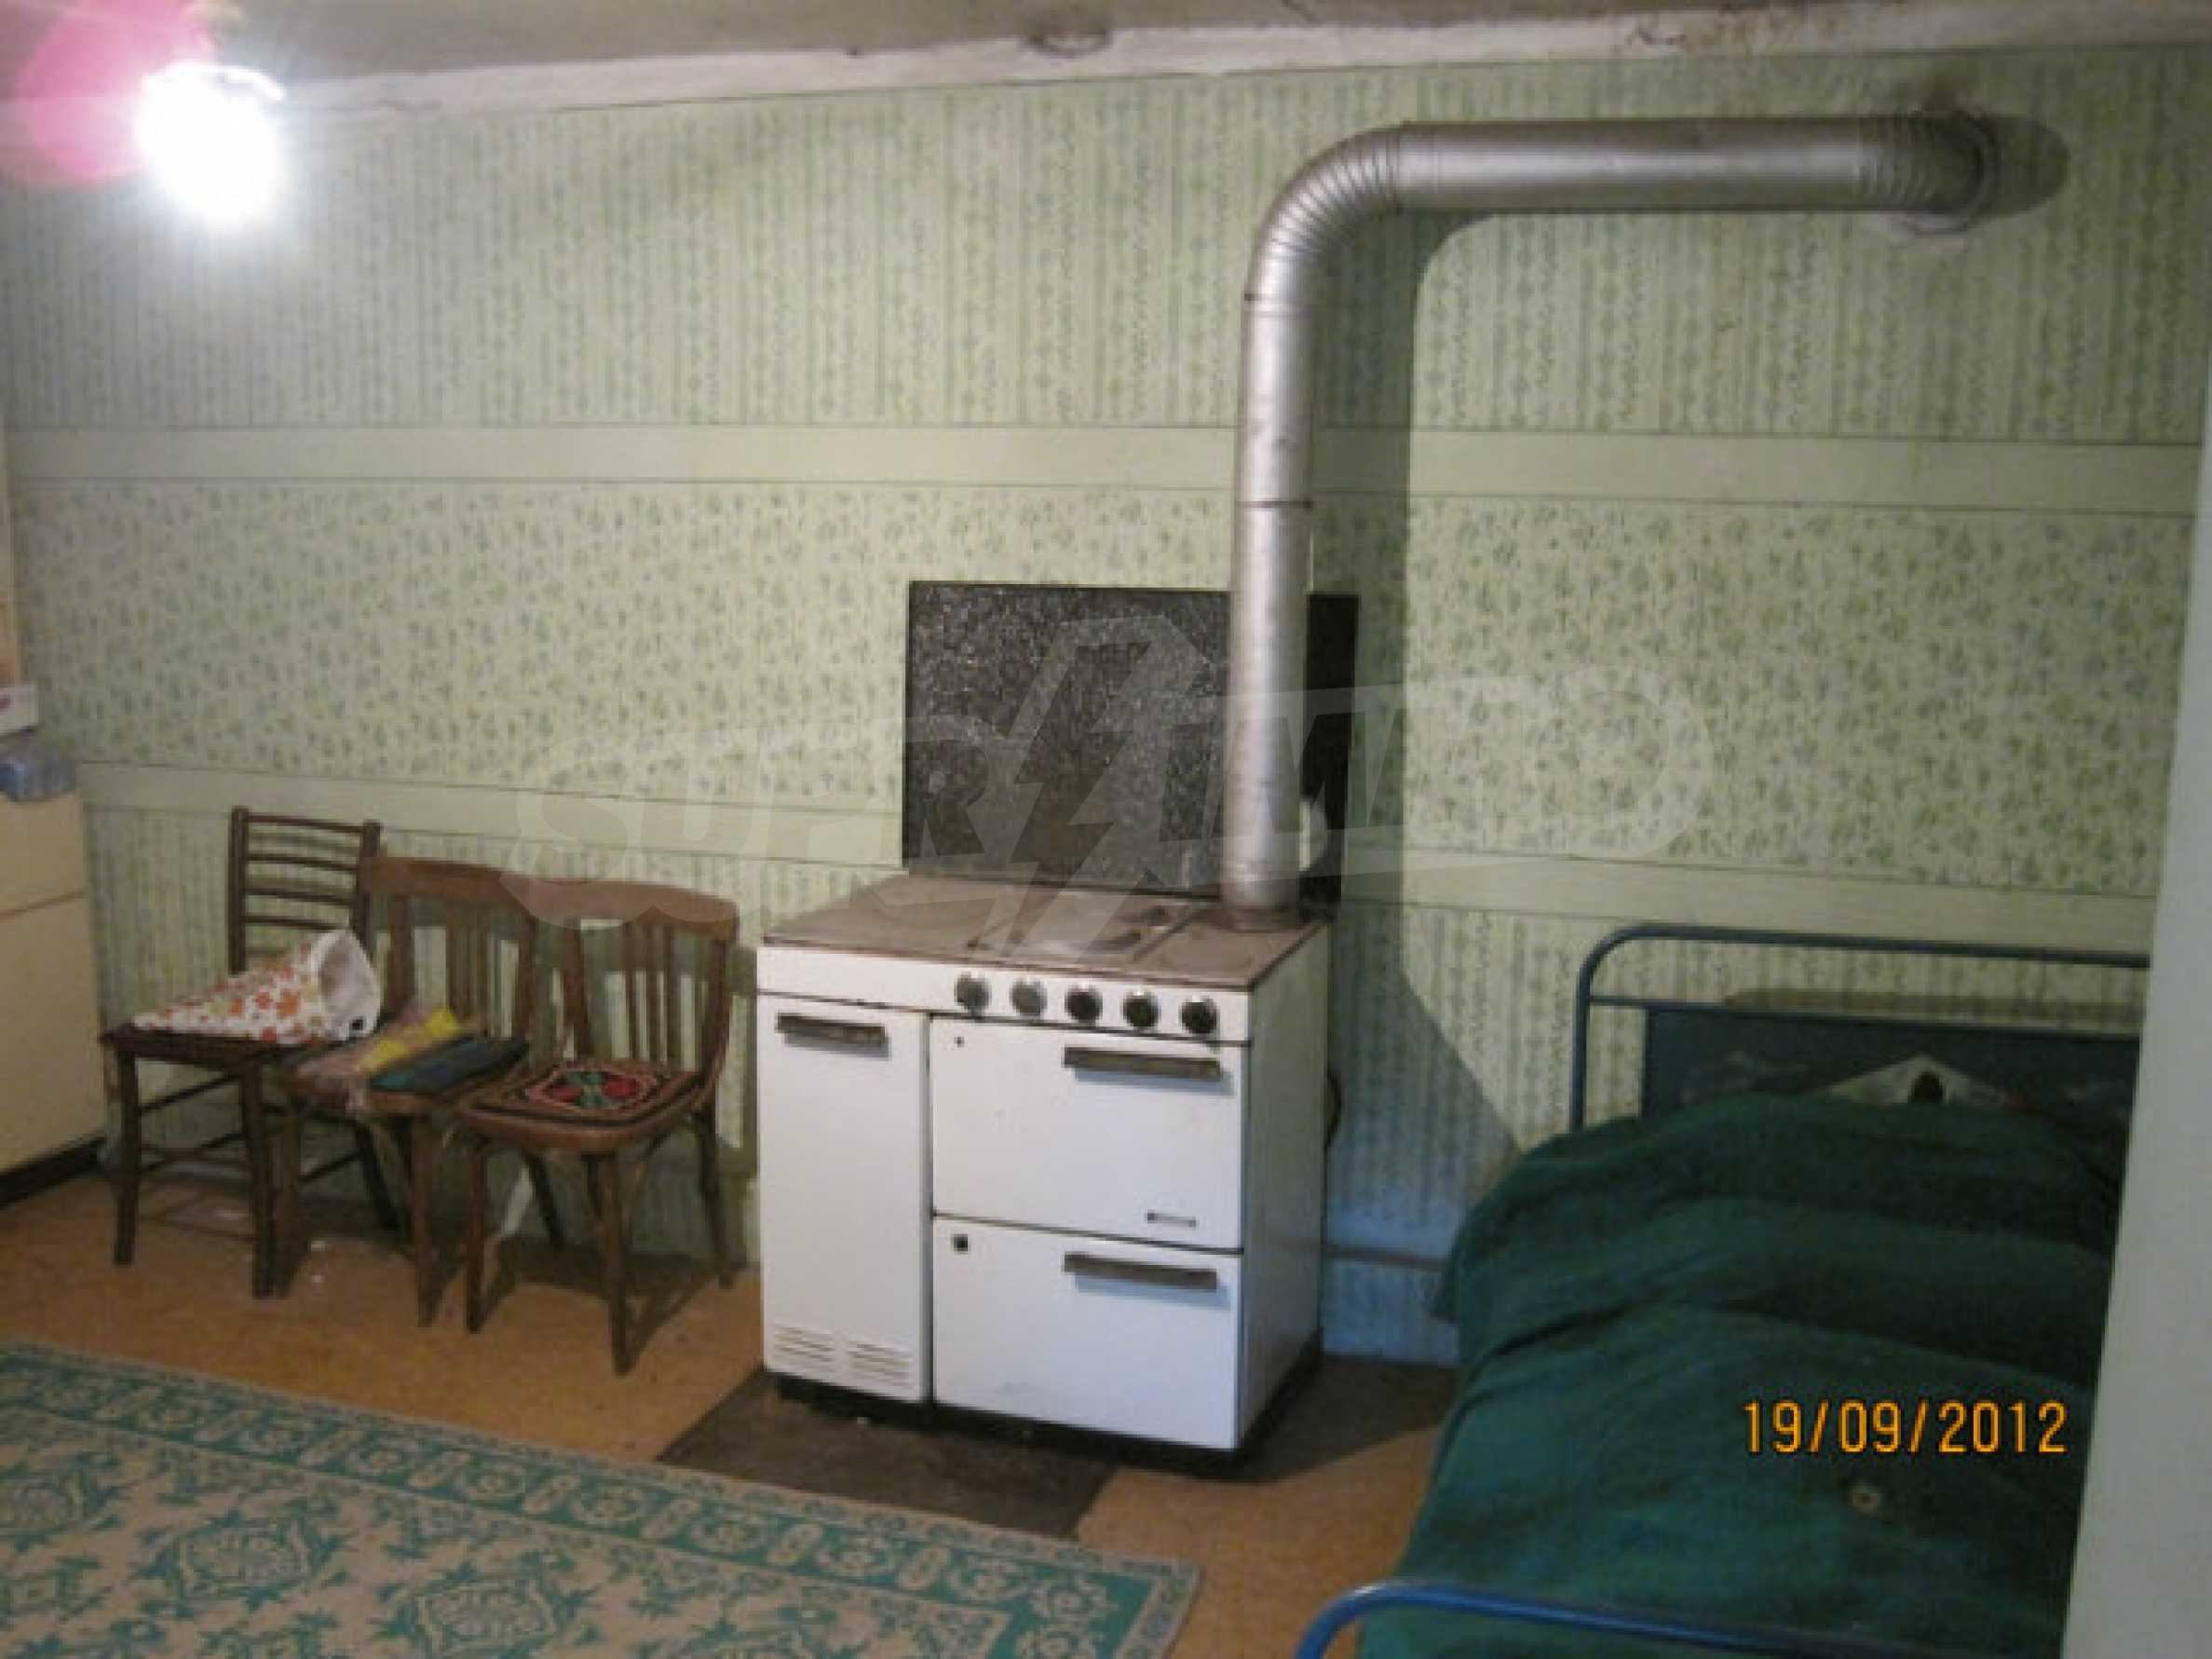 Detached house for sale in a quiet village near Dimitrovgrad 7